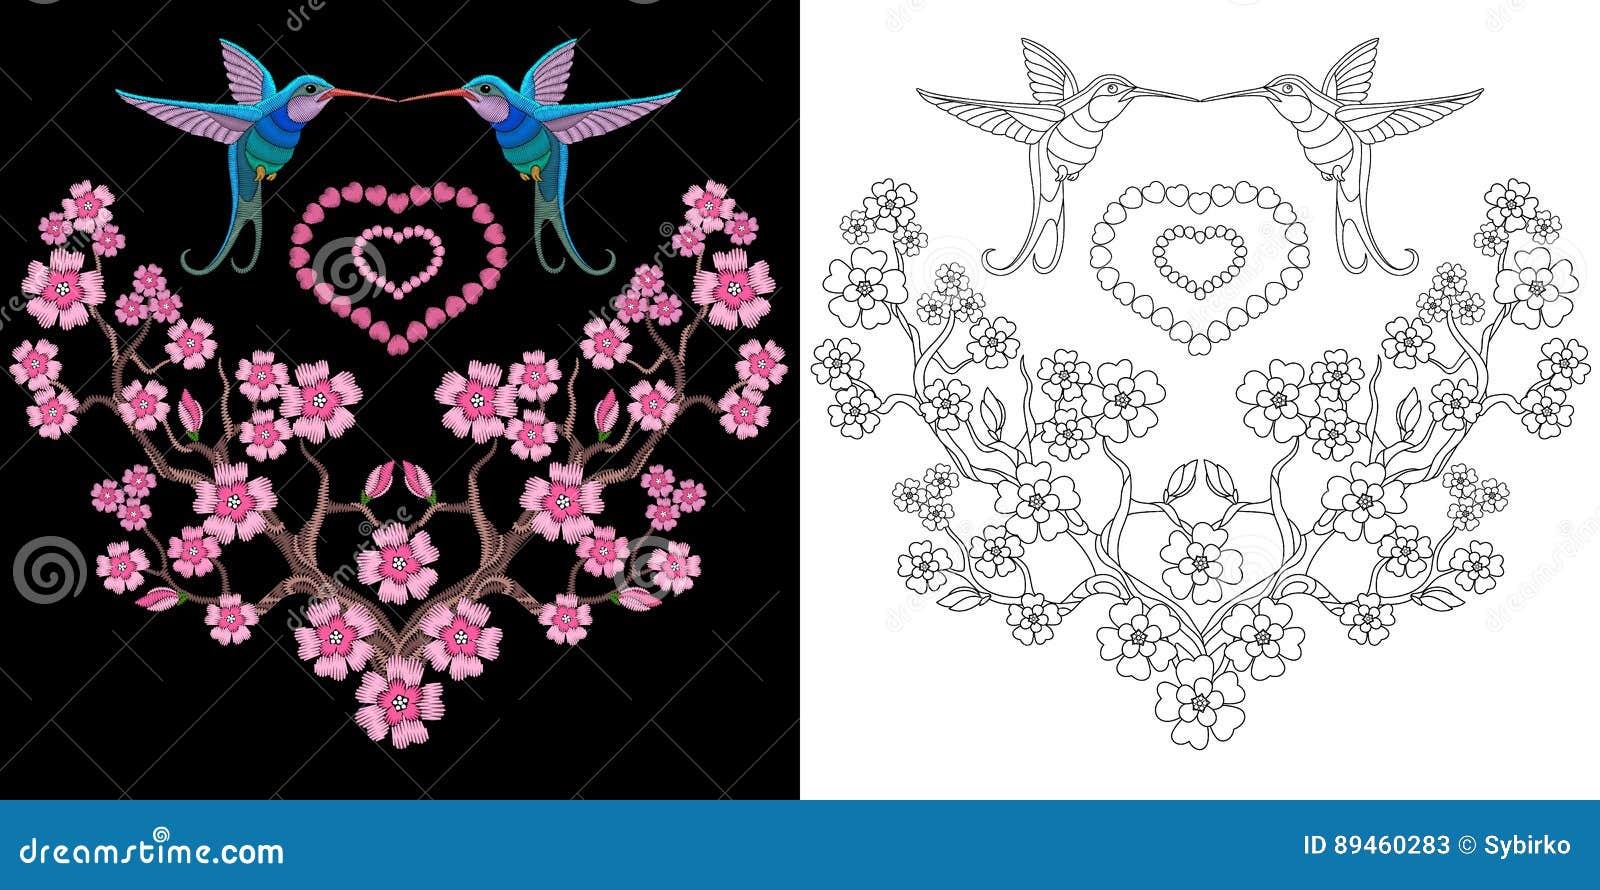 Embroidery hummingbird and sakura design